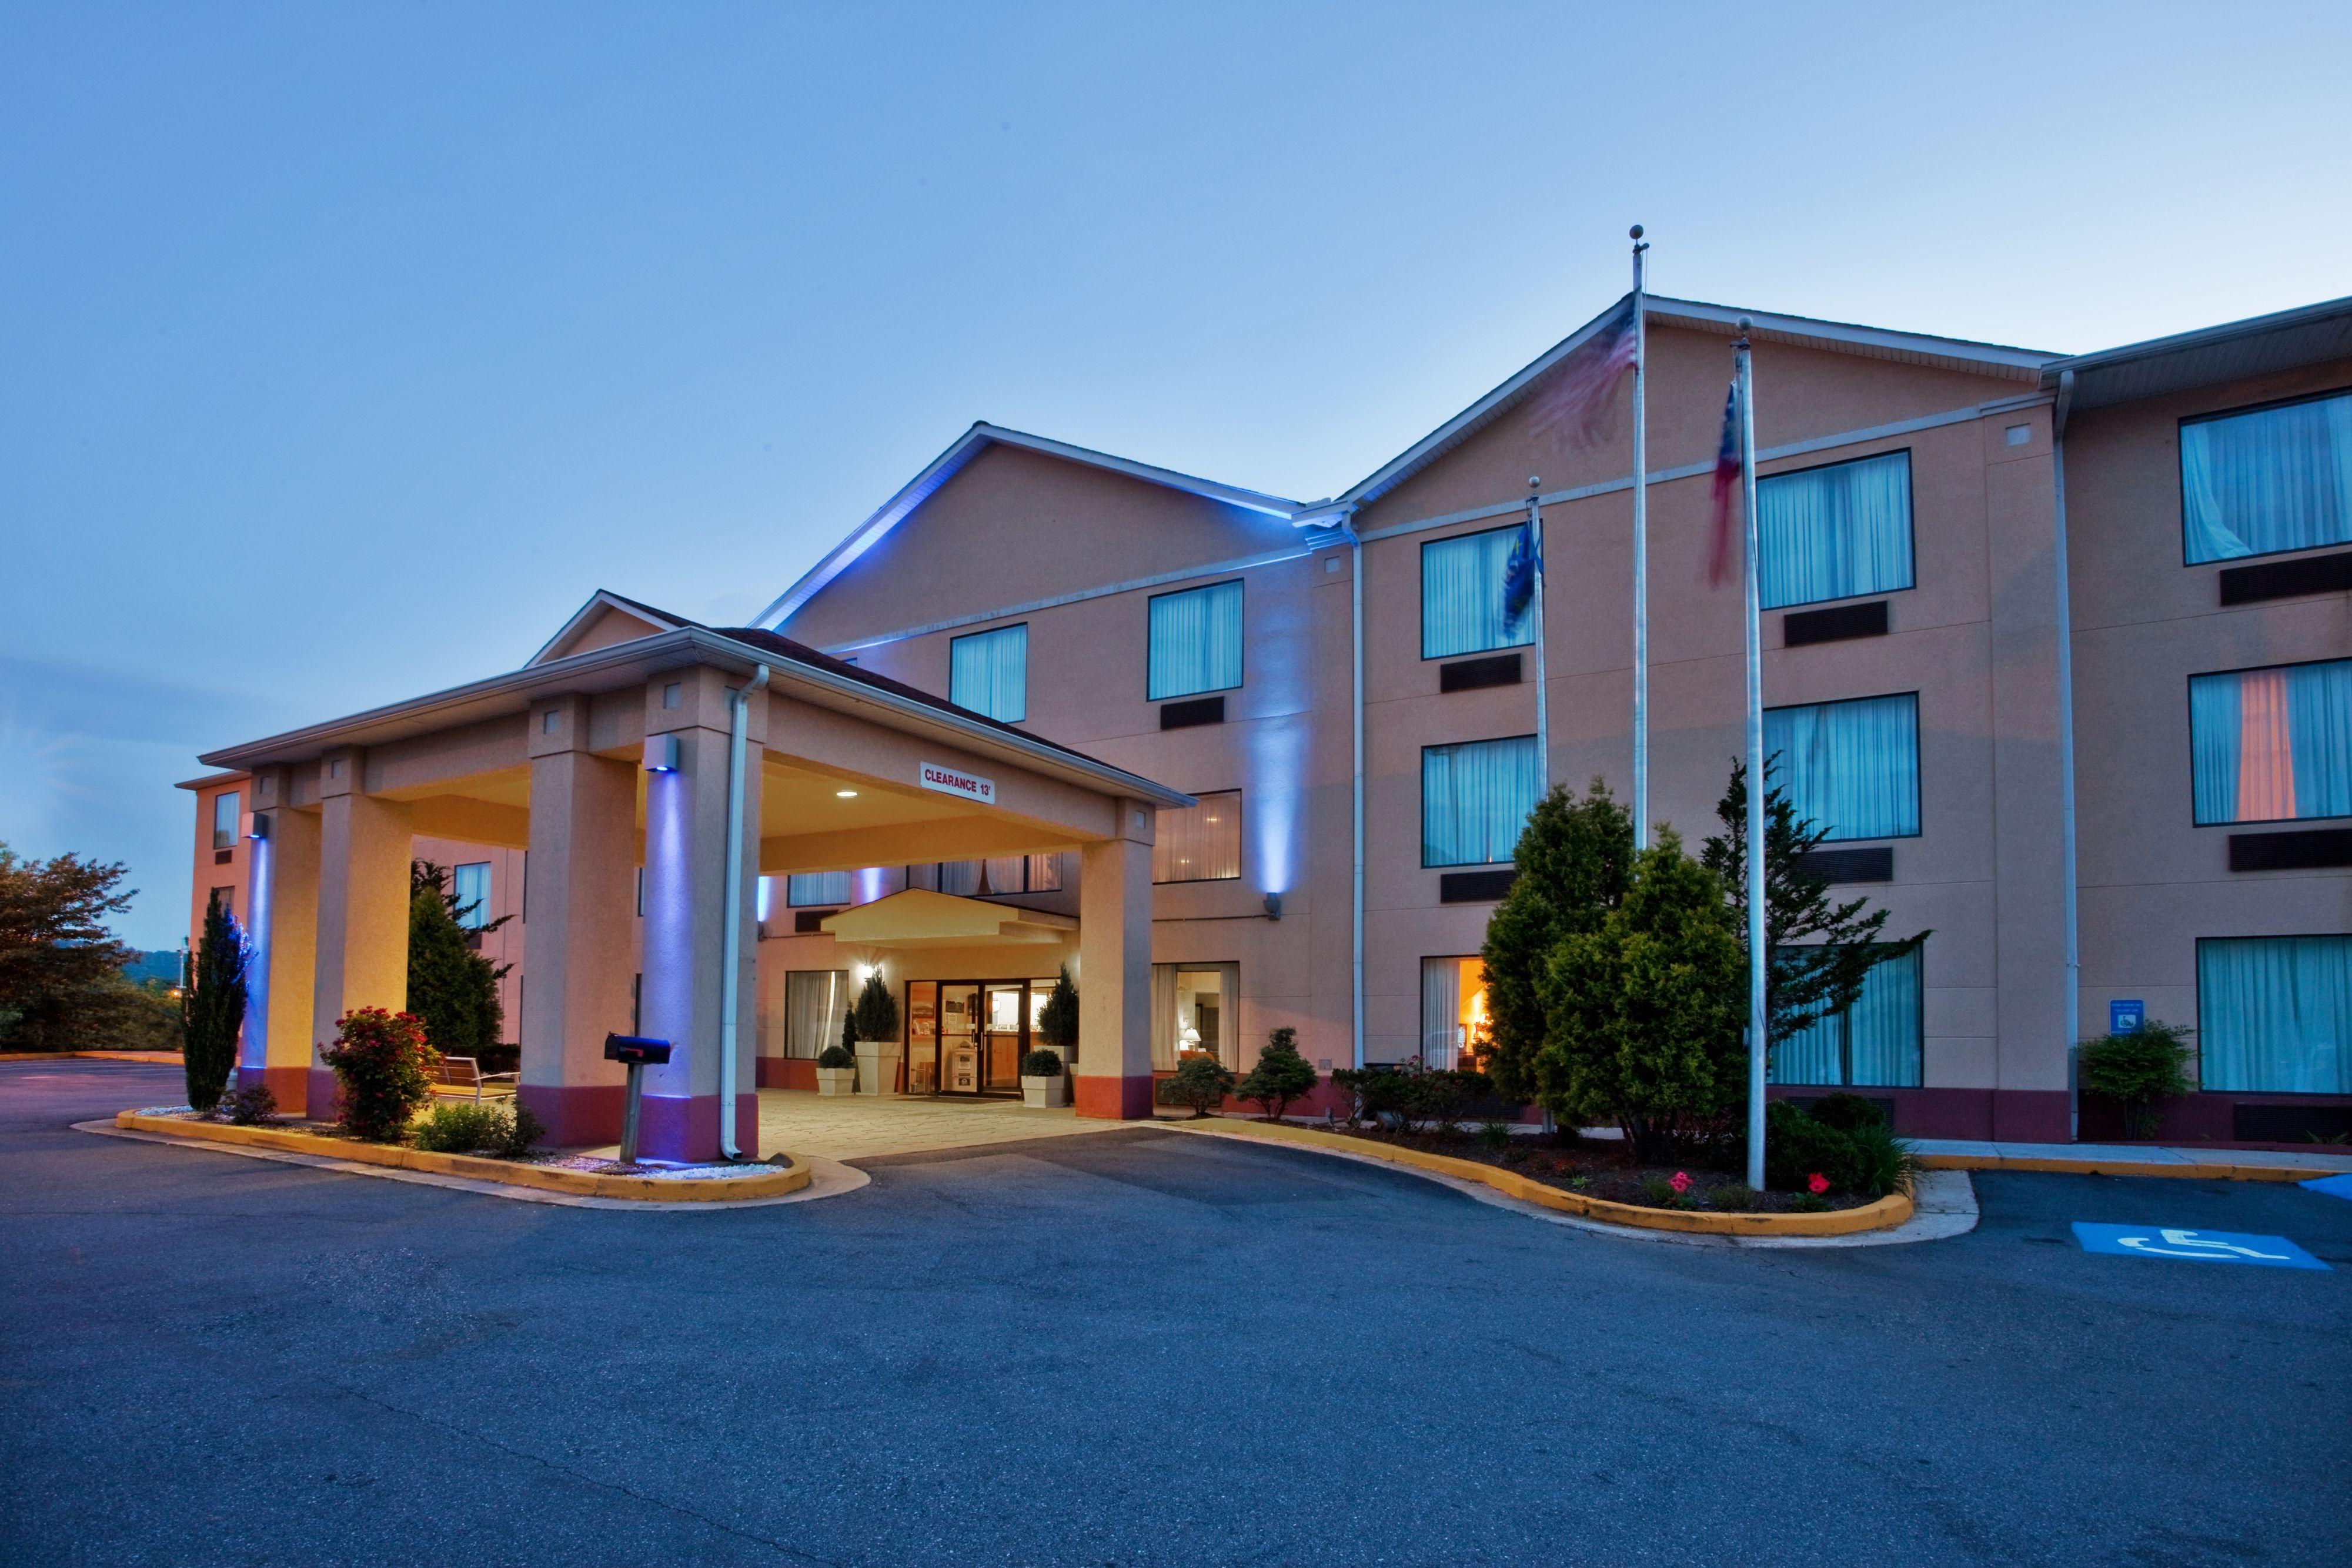 Holiday Inn Express Hershey  Harrisburg Area   Hummelstown Pennsylvania  Pa